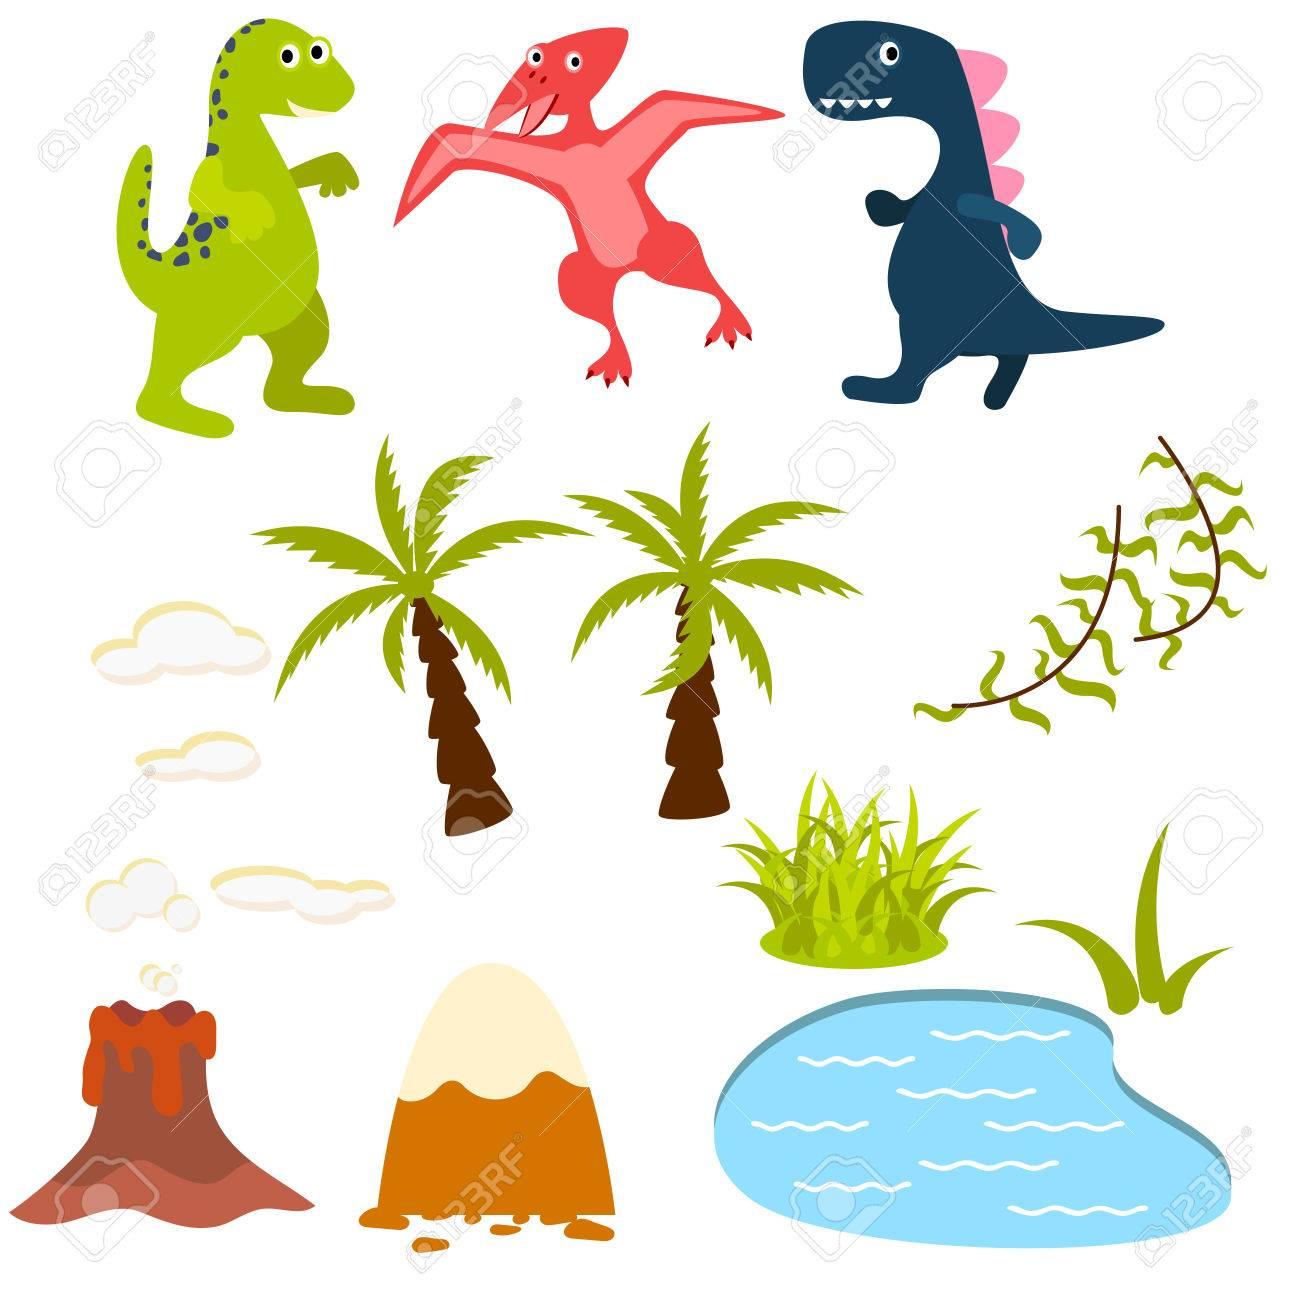 set of cartoon dinosaur clipart illustration dino in rainforest rh 123rf com Realistic Dinosaur Clip Art Dinosaur Coloring Pages